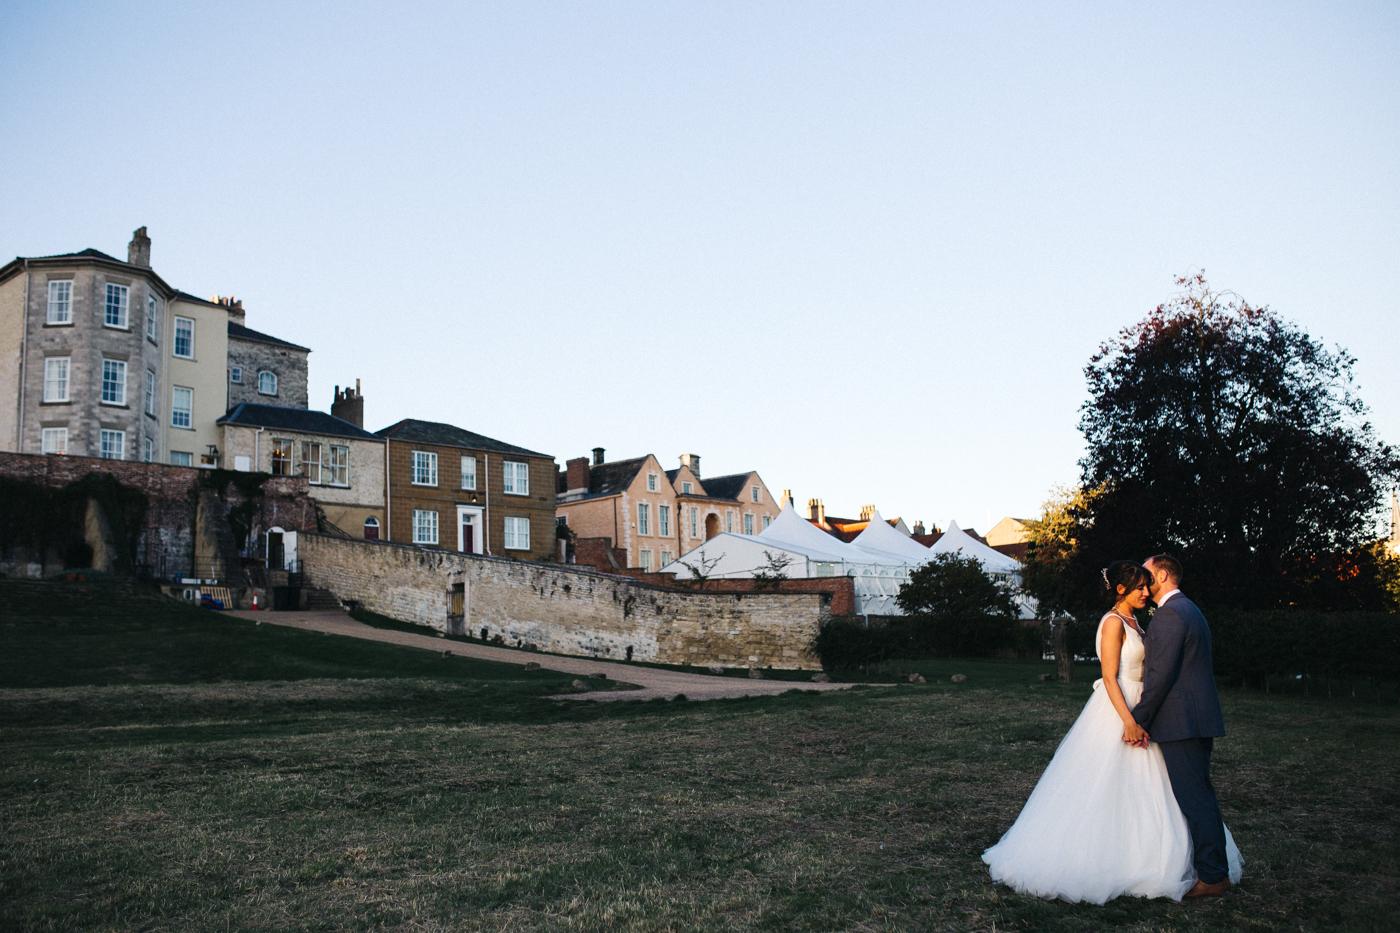 york-house-malton-wedding-photographer-north-yorkshire-0032.jpg